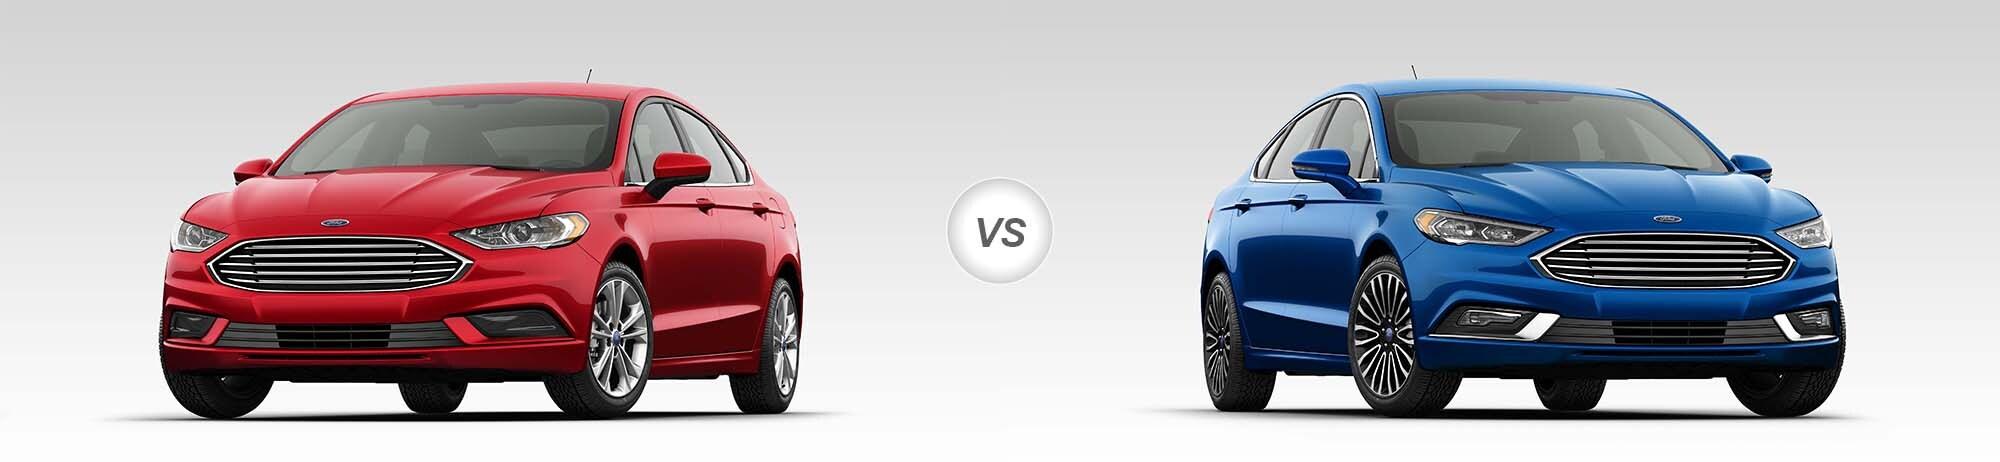 2018 Ford Fusion SE vs 2018 Ford Fusion Titanium